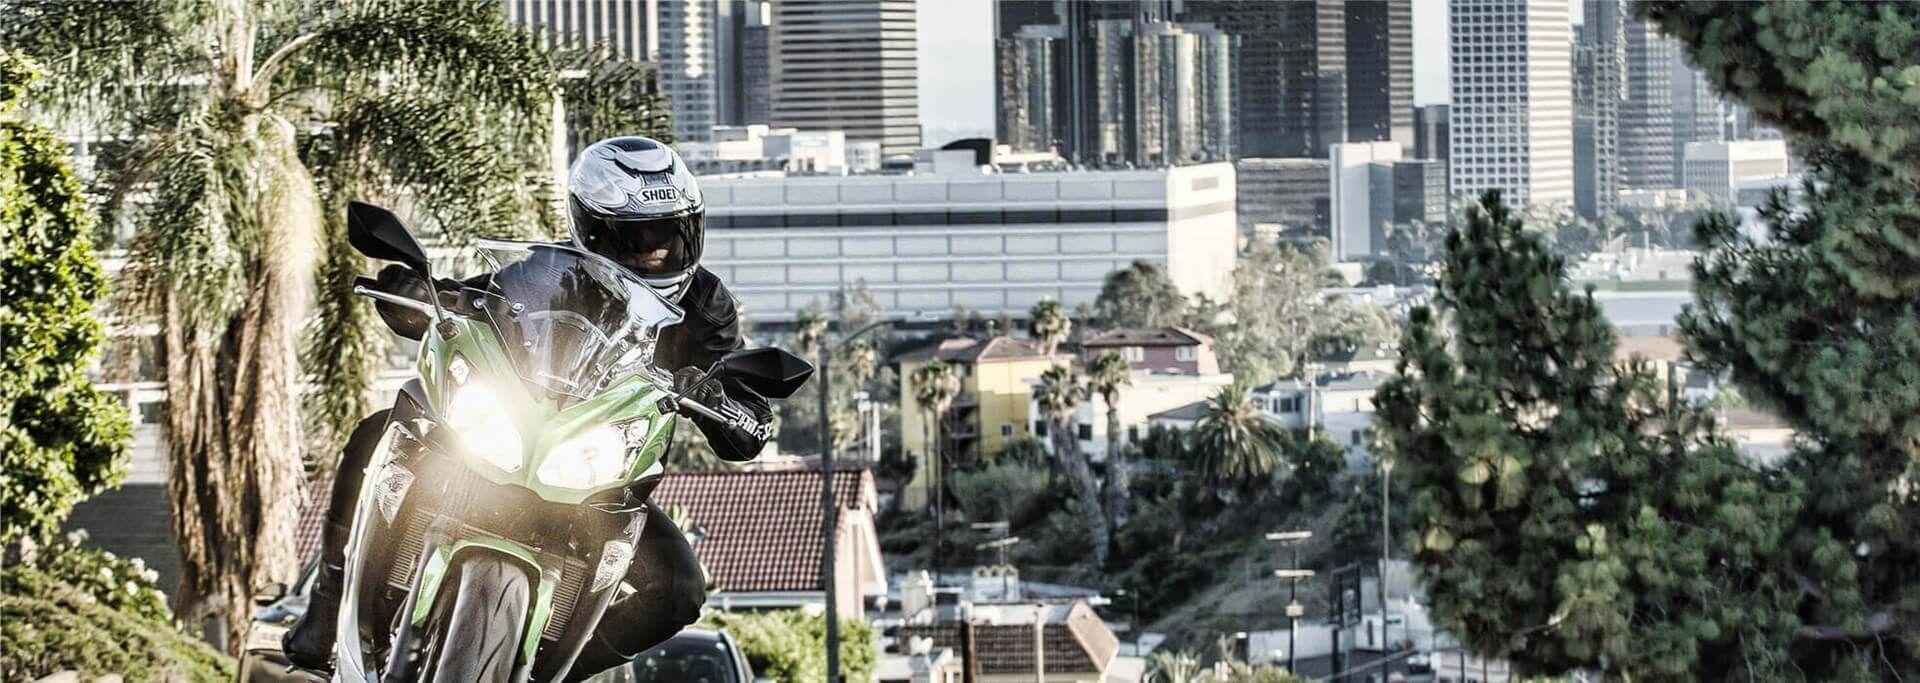 Palmetto Motorsports in Florida | Kawasaki, Suzuki, KTM